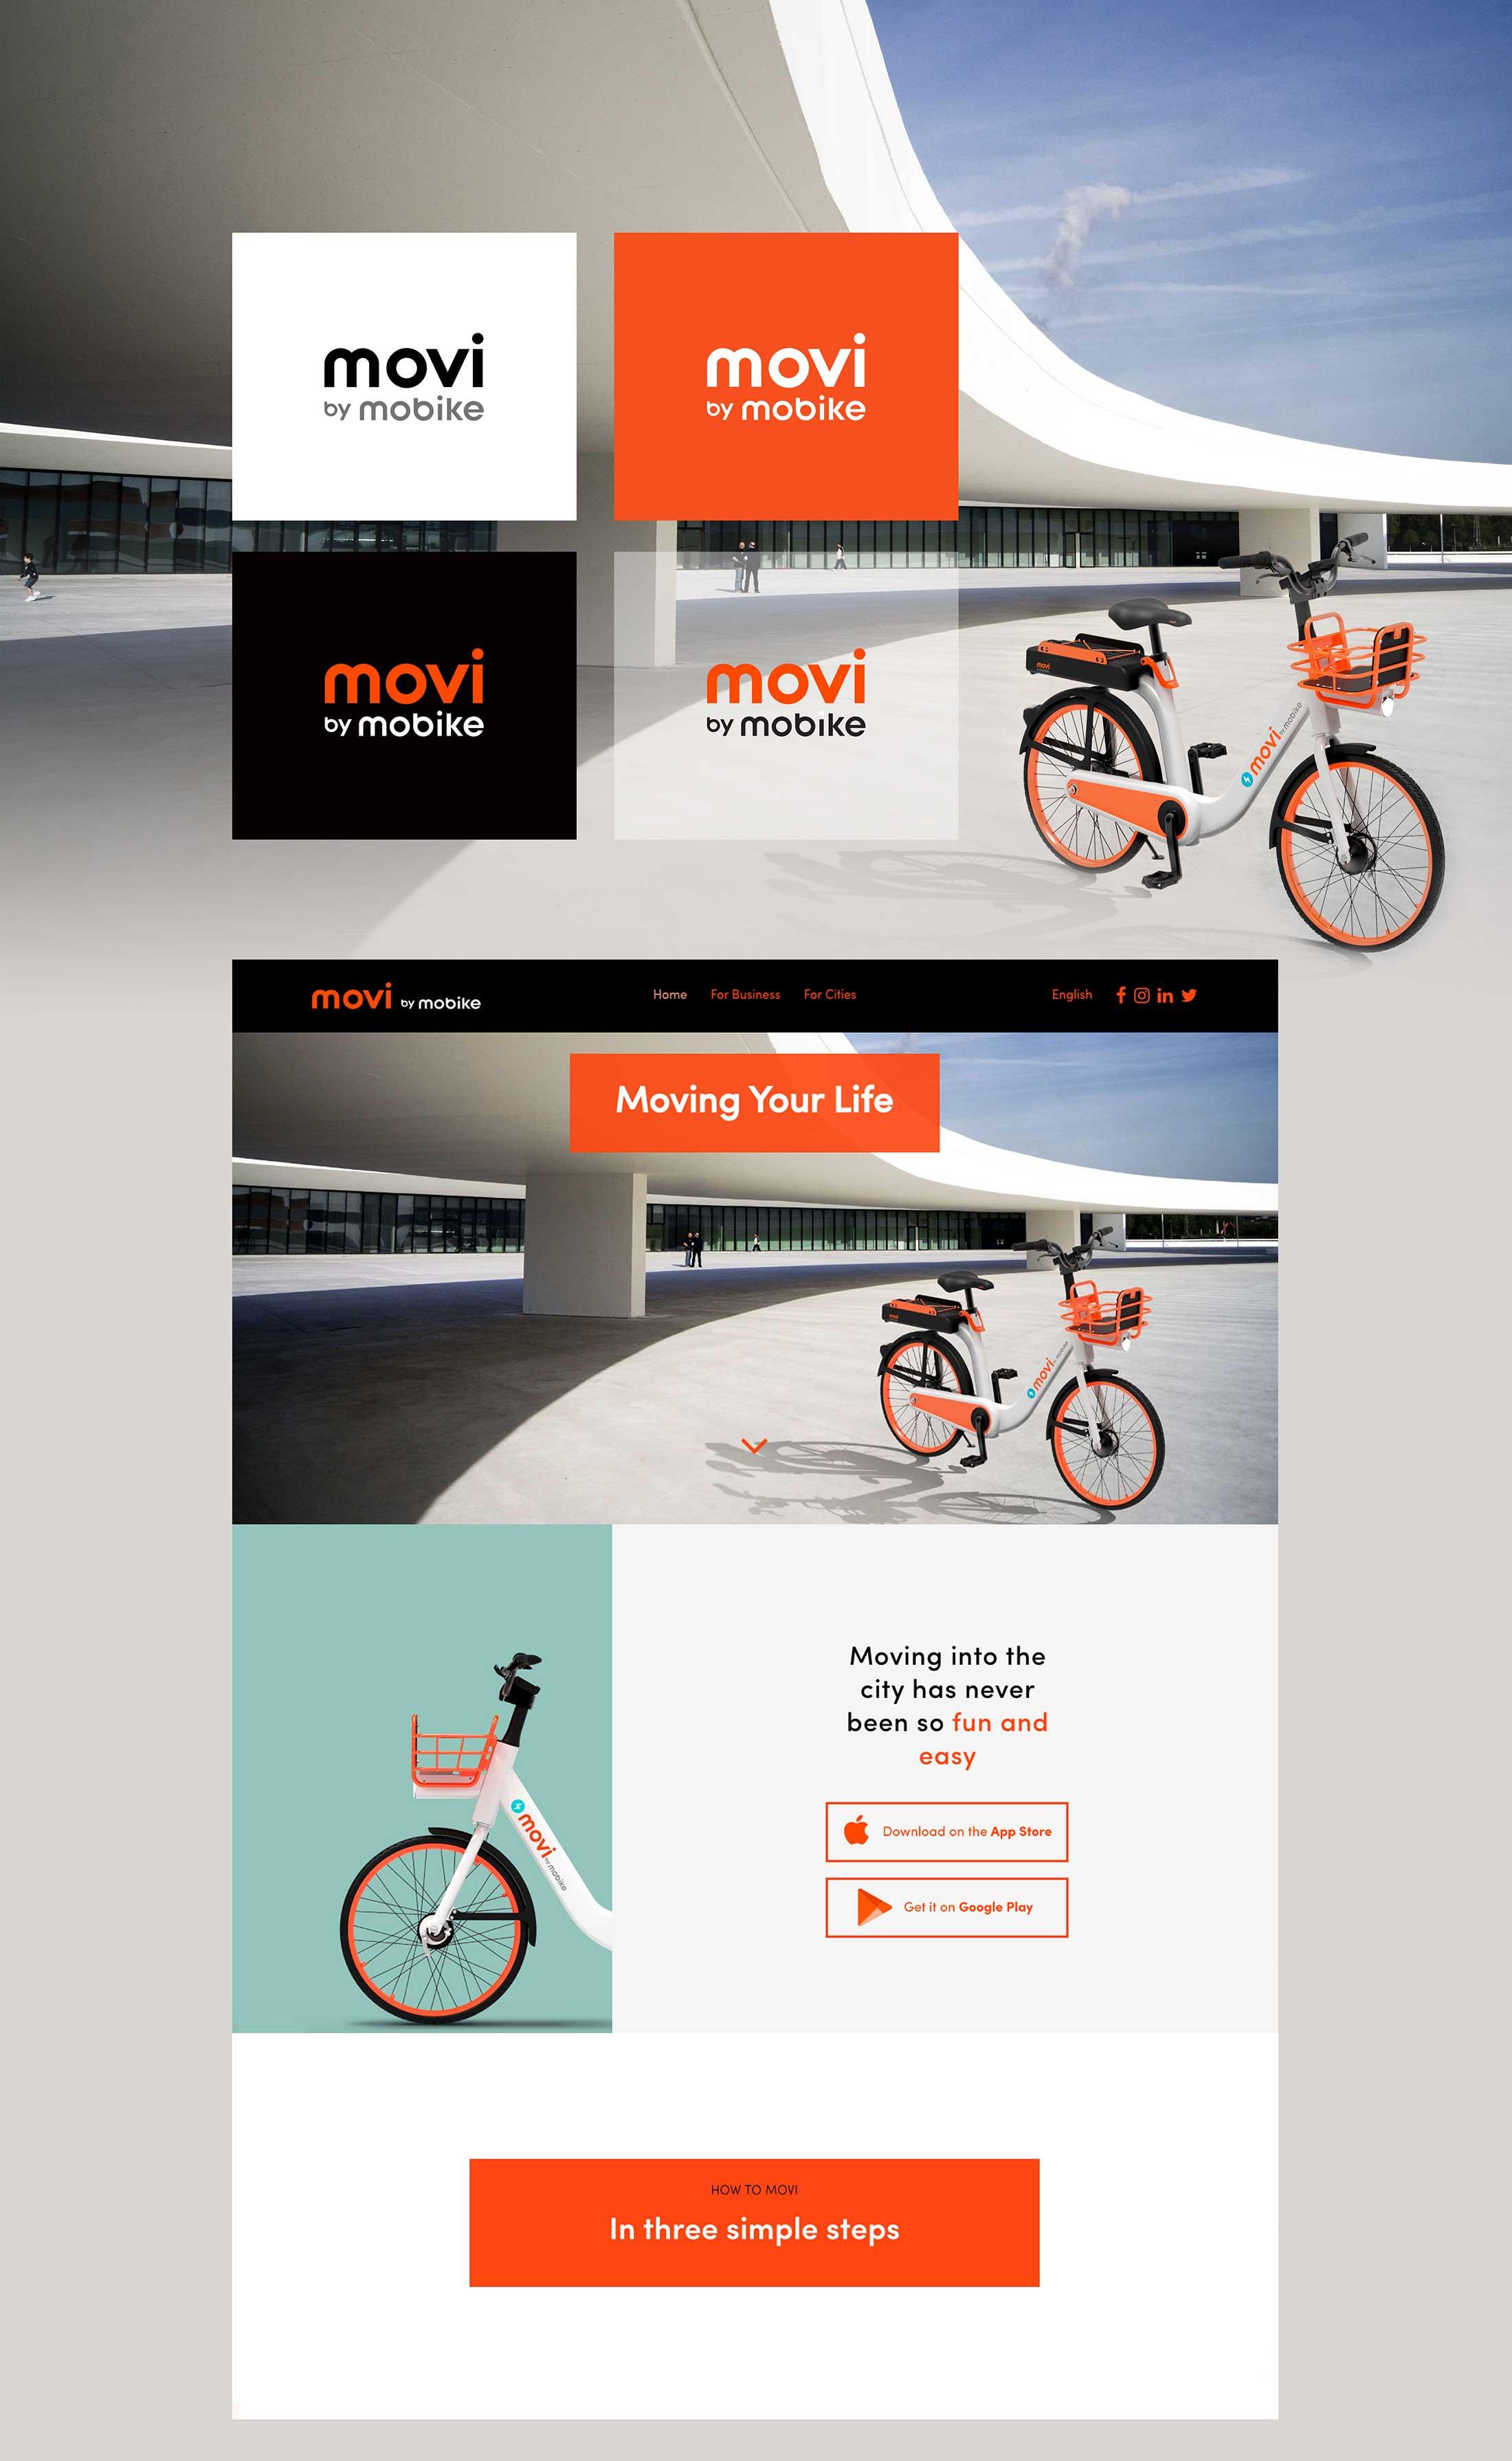 movi-by-mobike-design-webdesign-padova-01